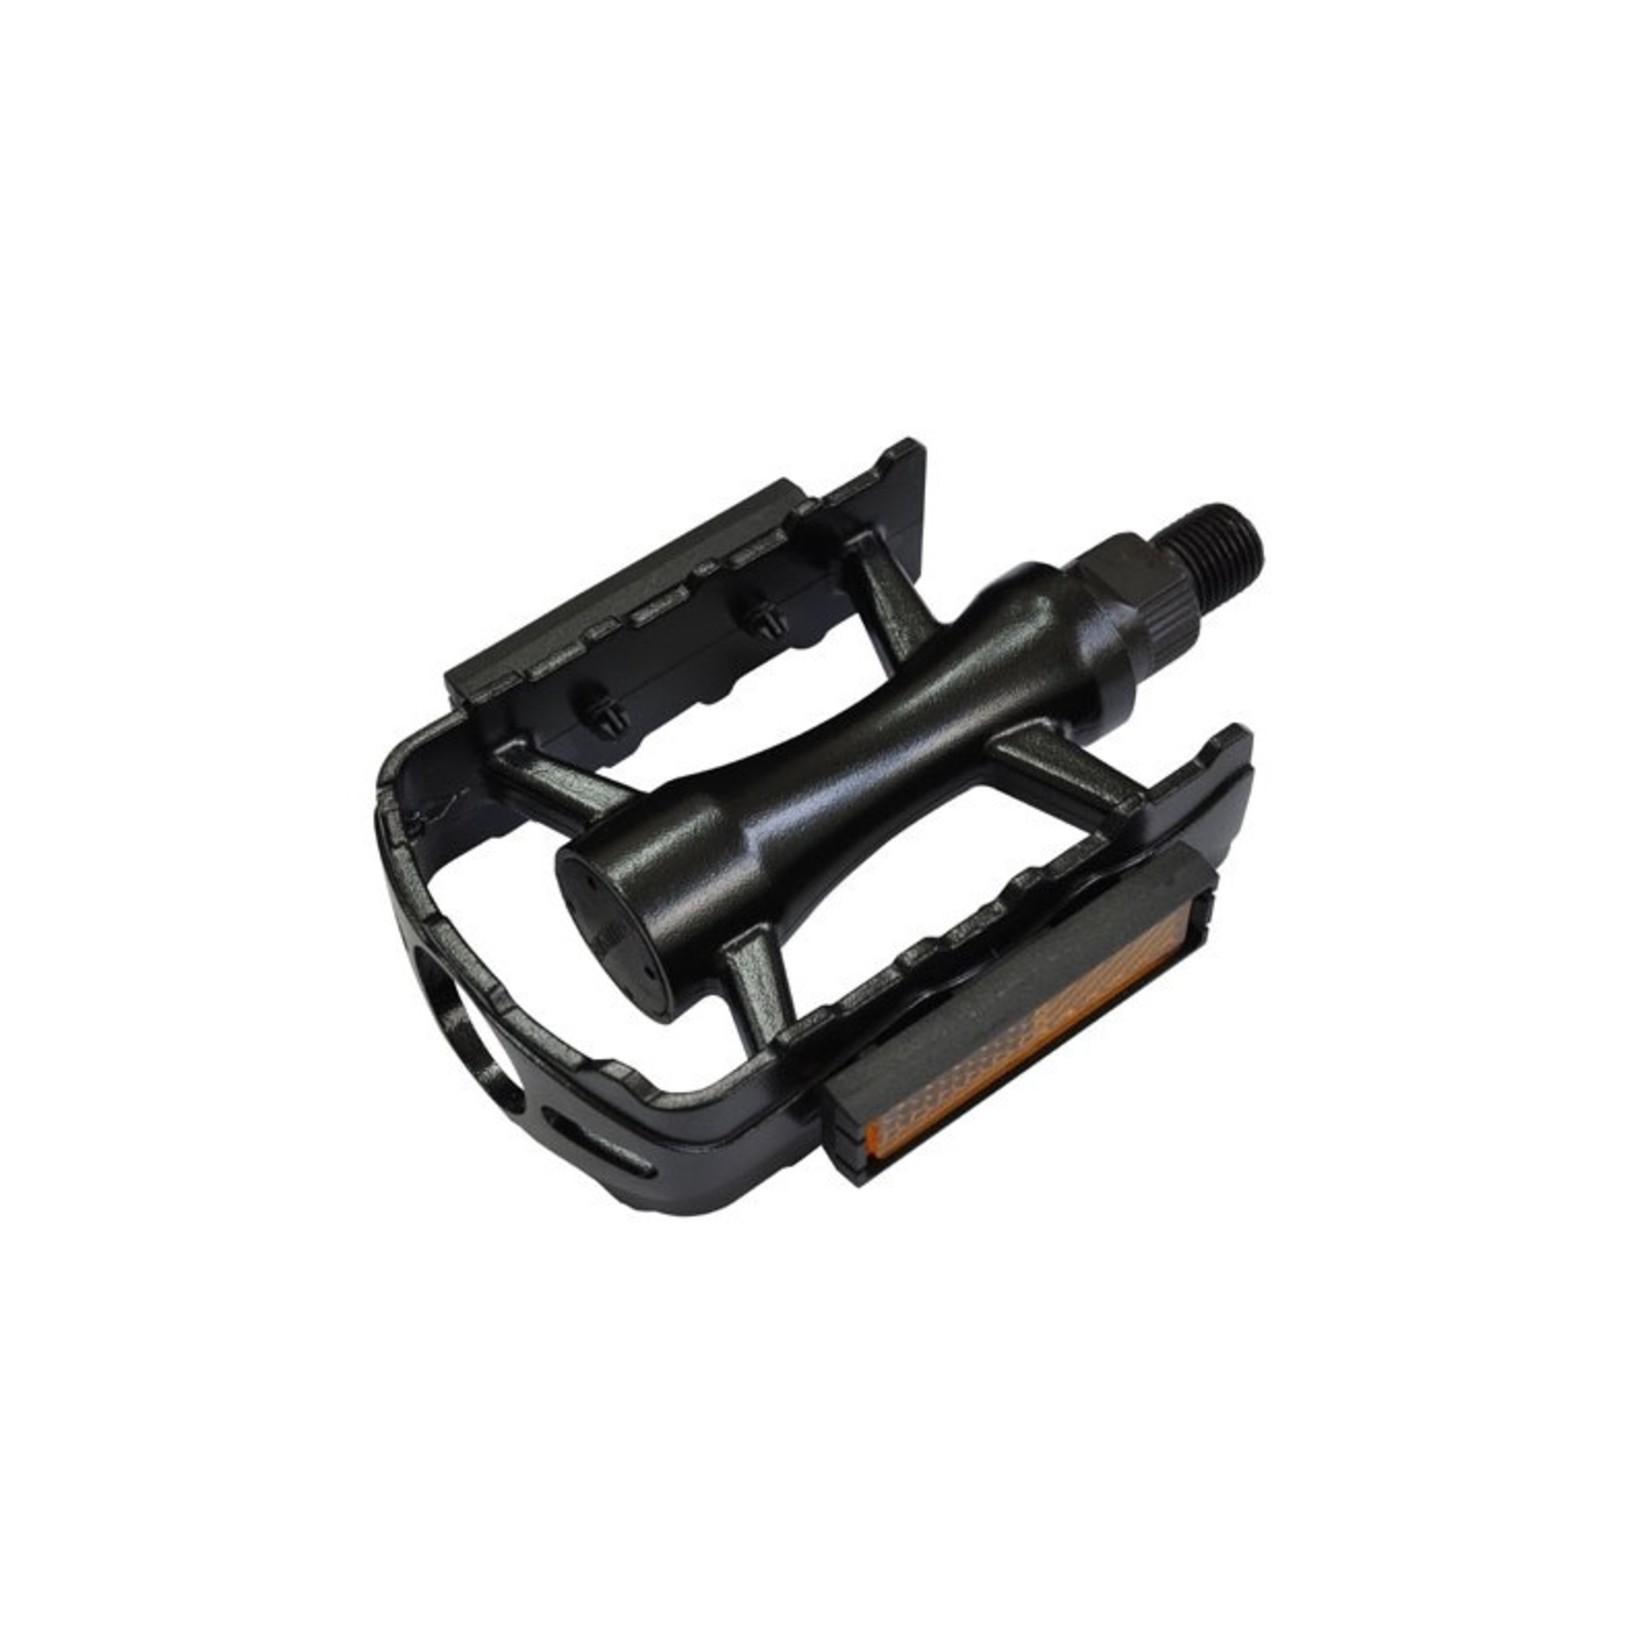 UNION TOE-STRAP PEDAL SP-610 BLACK ALL ALLOY